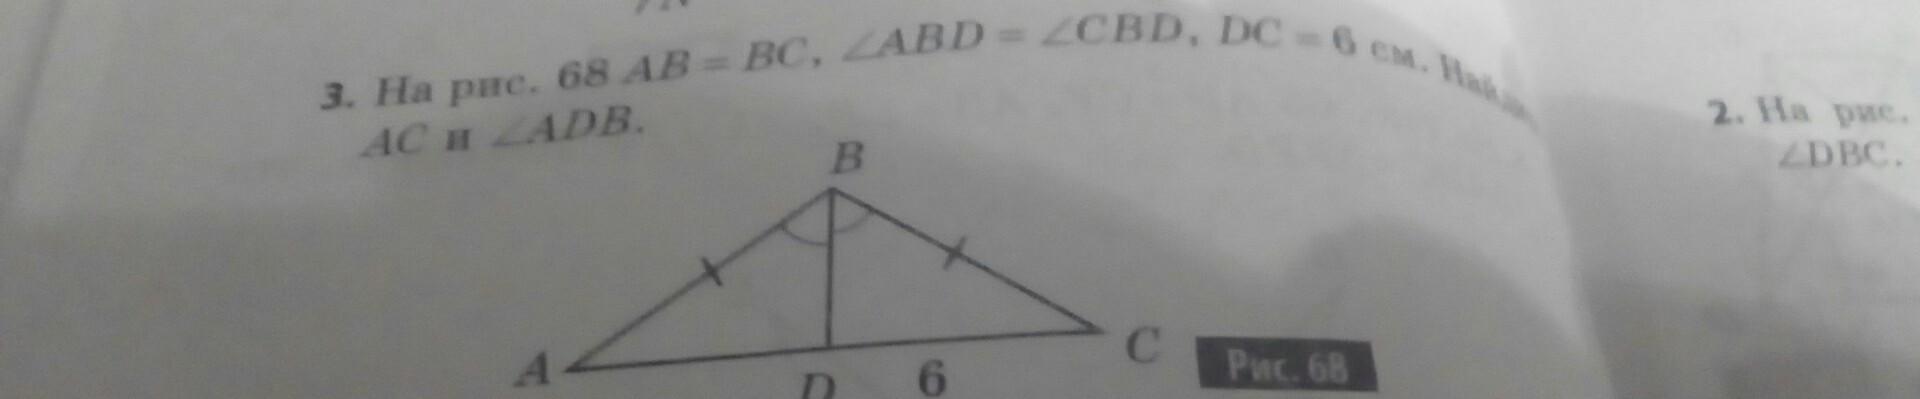 Ab равно BC, Угол ABC равен углу cbd, bc равен 6 см Найдите аc и Угол ABC